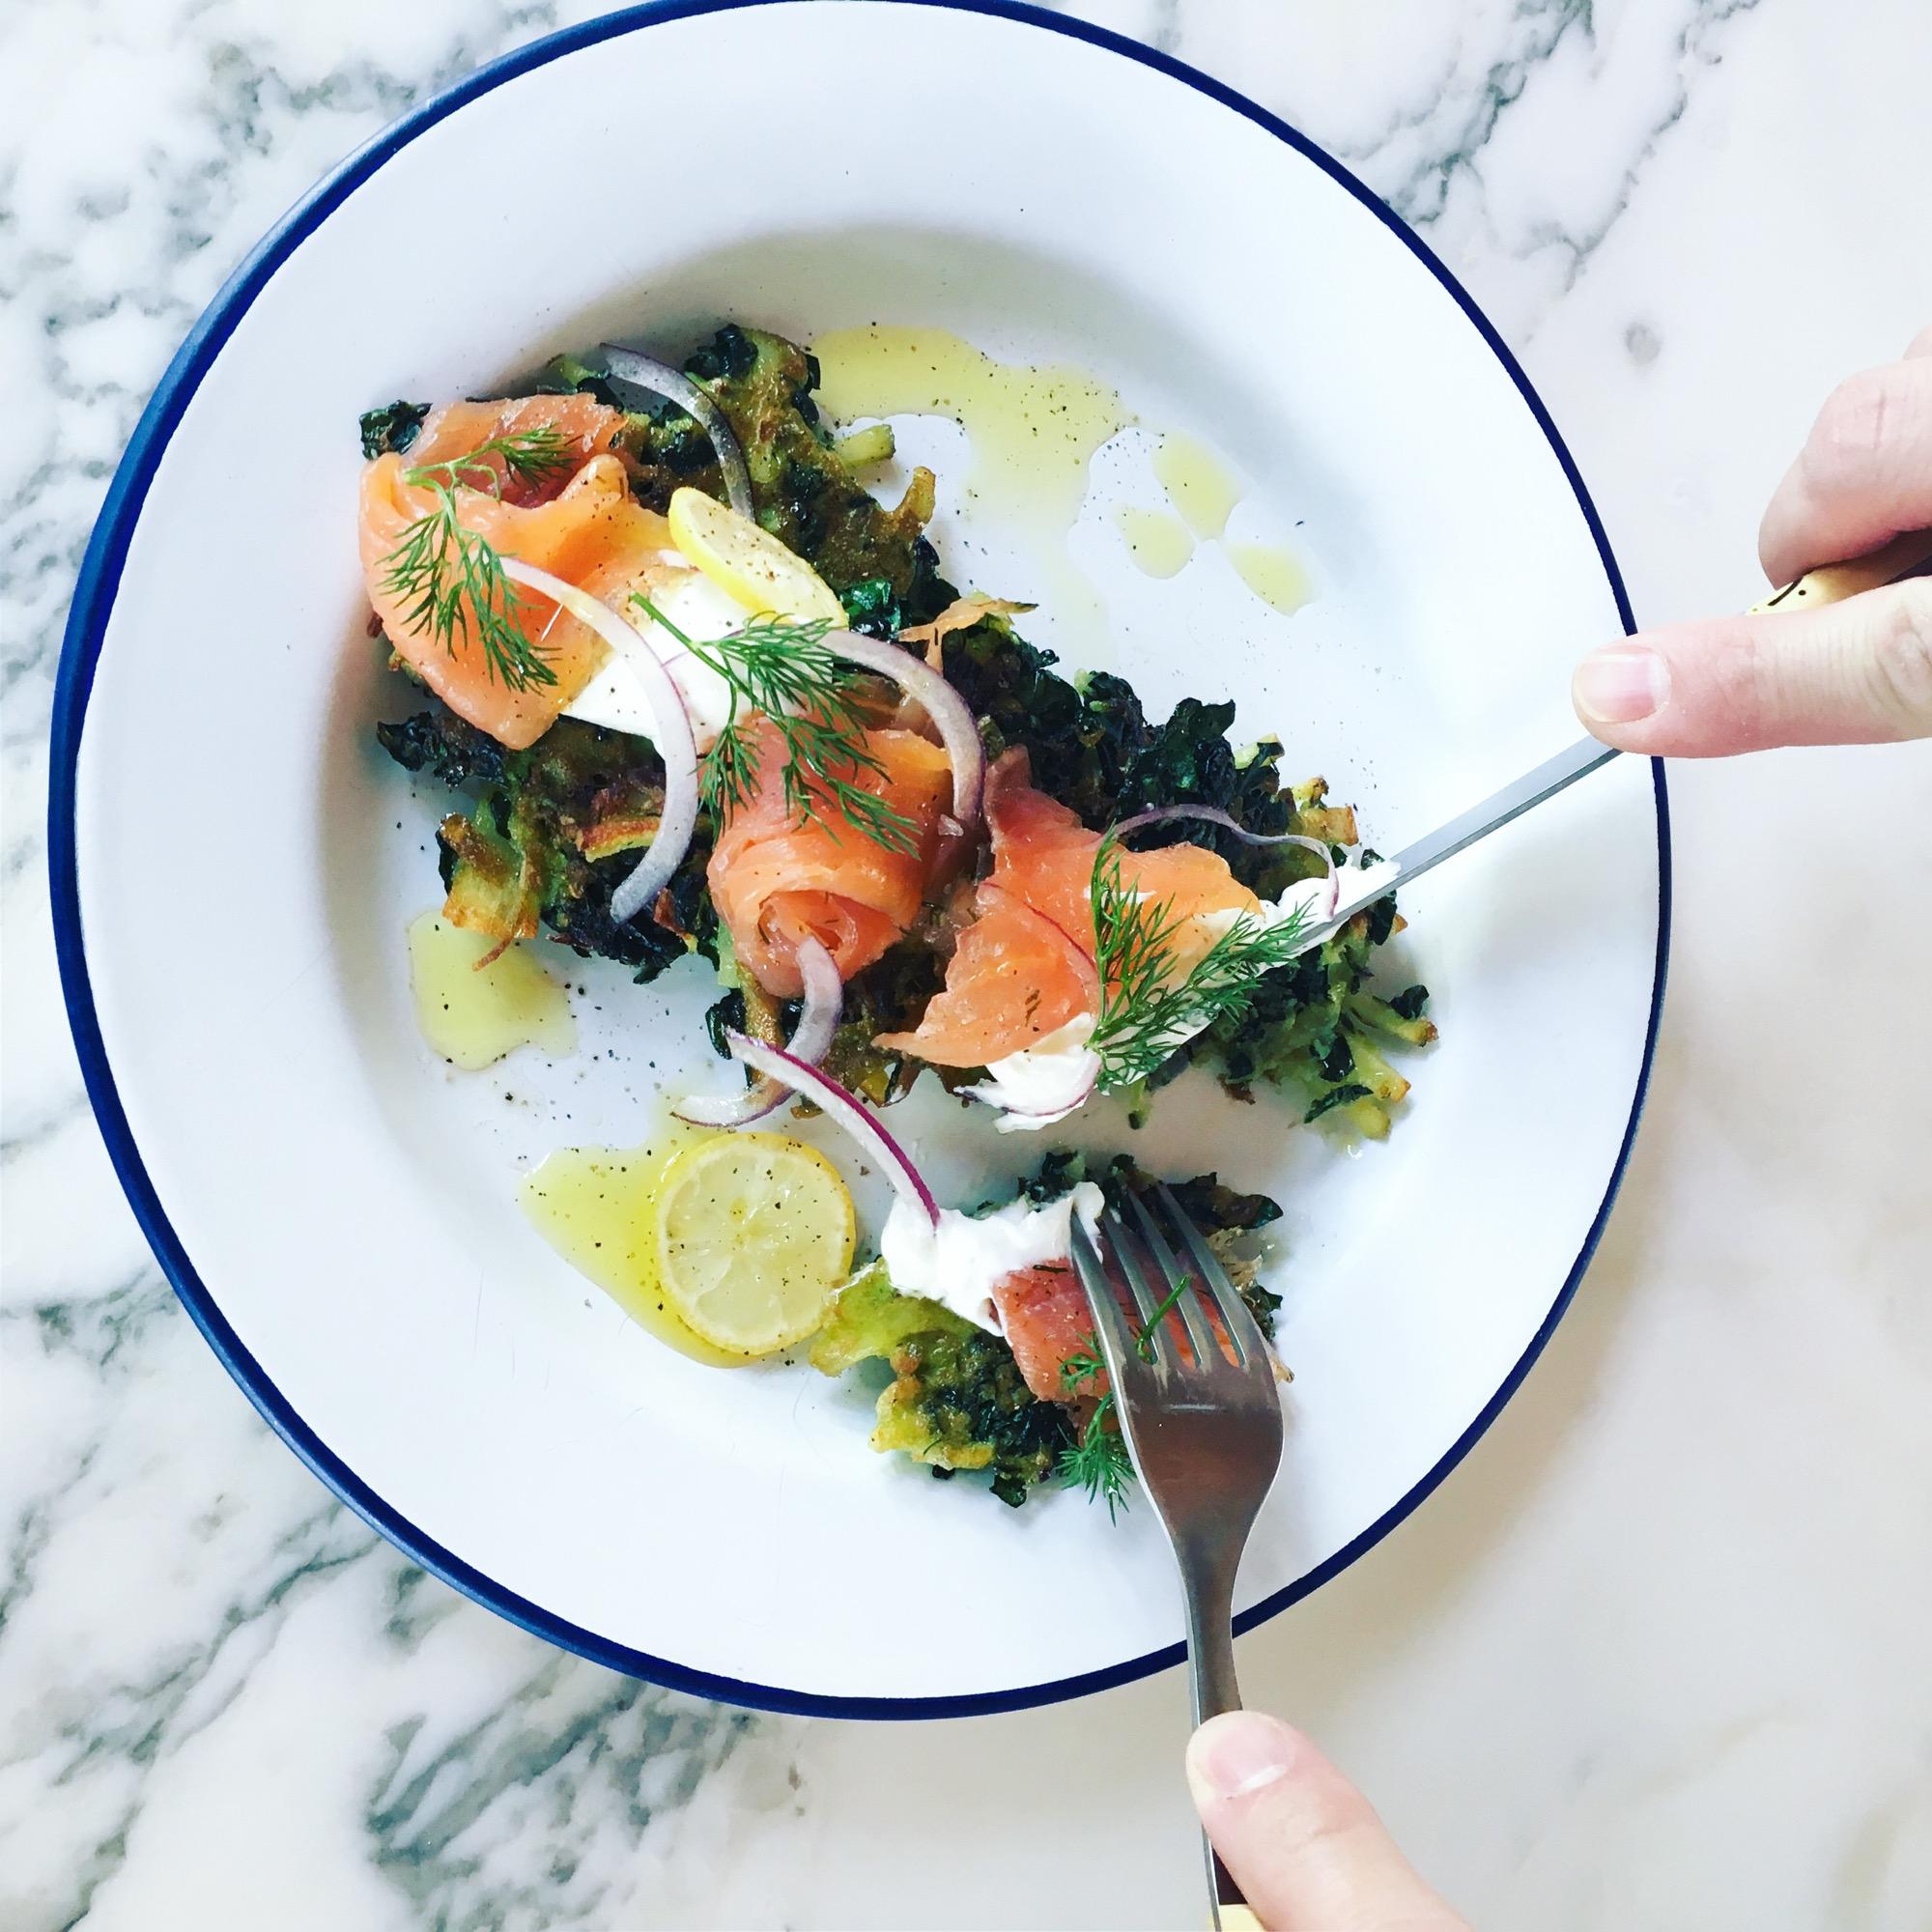 Kale & Potato Pancakes with Gravlax and Nordic Yogurt / Recipe by Alpine Modern